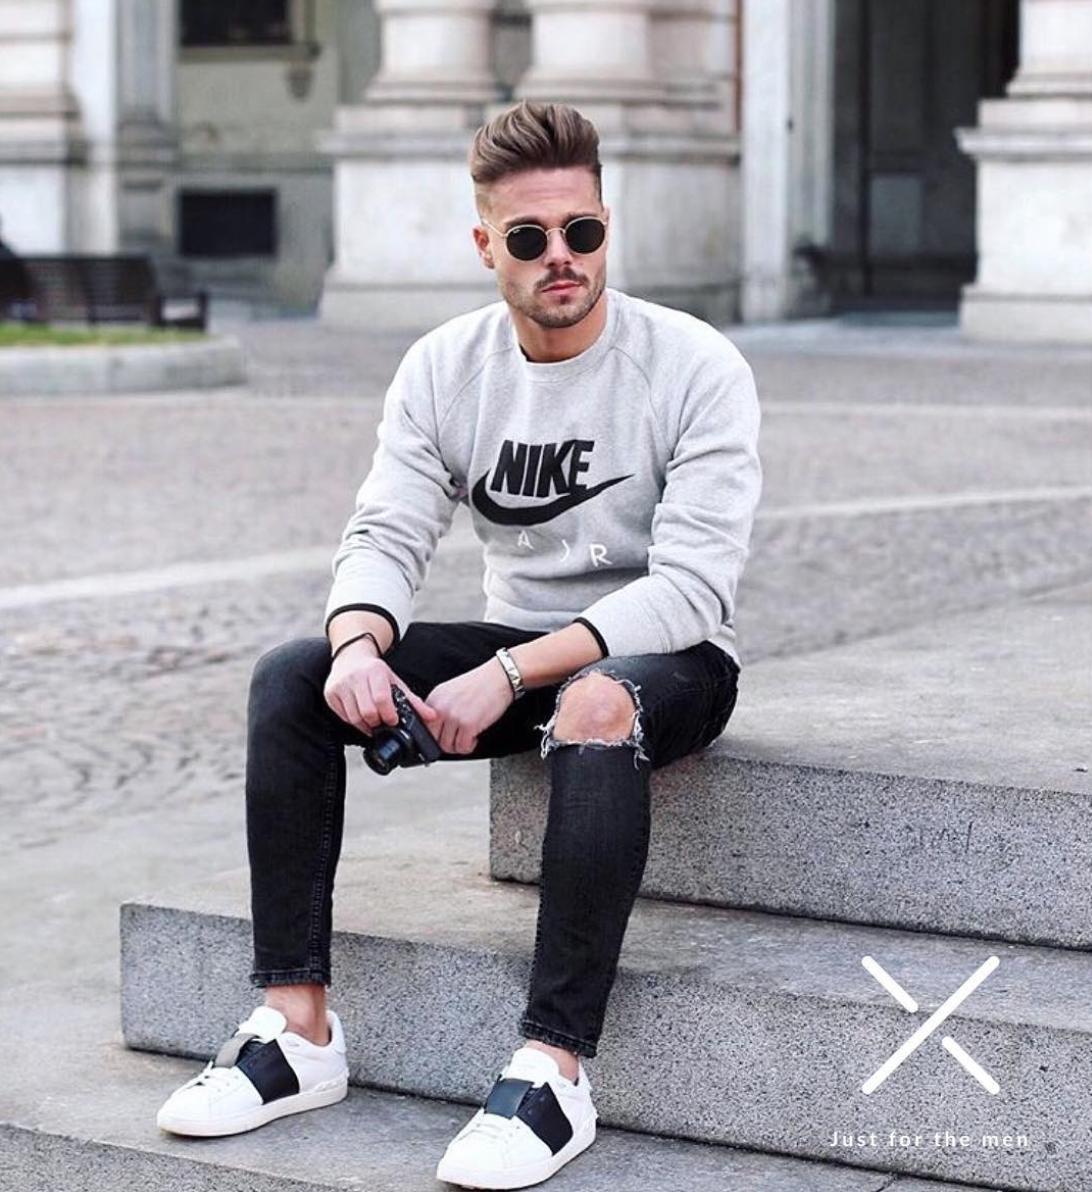 Moda para hombres 2018    Fashion for men 2018 Just for the men ... 2903ea29b32